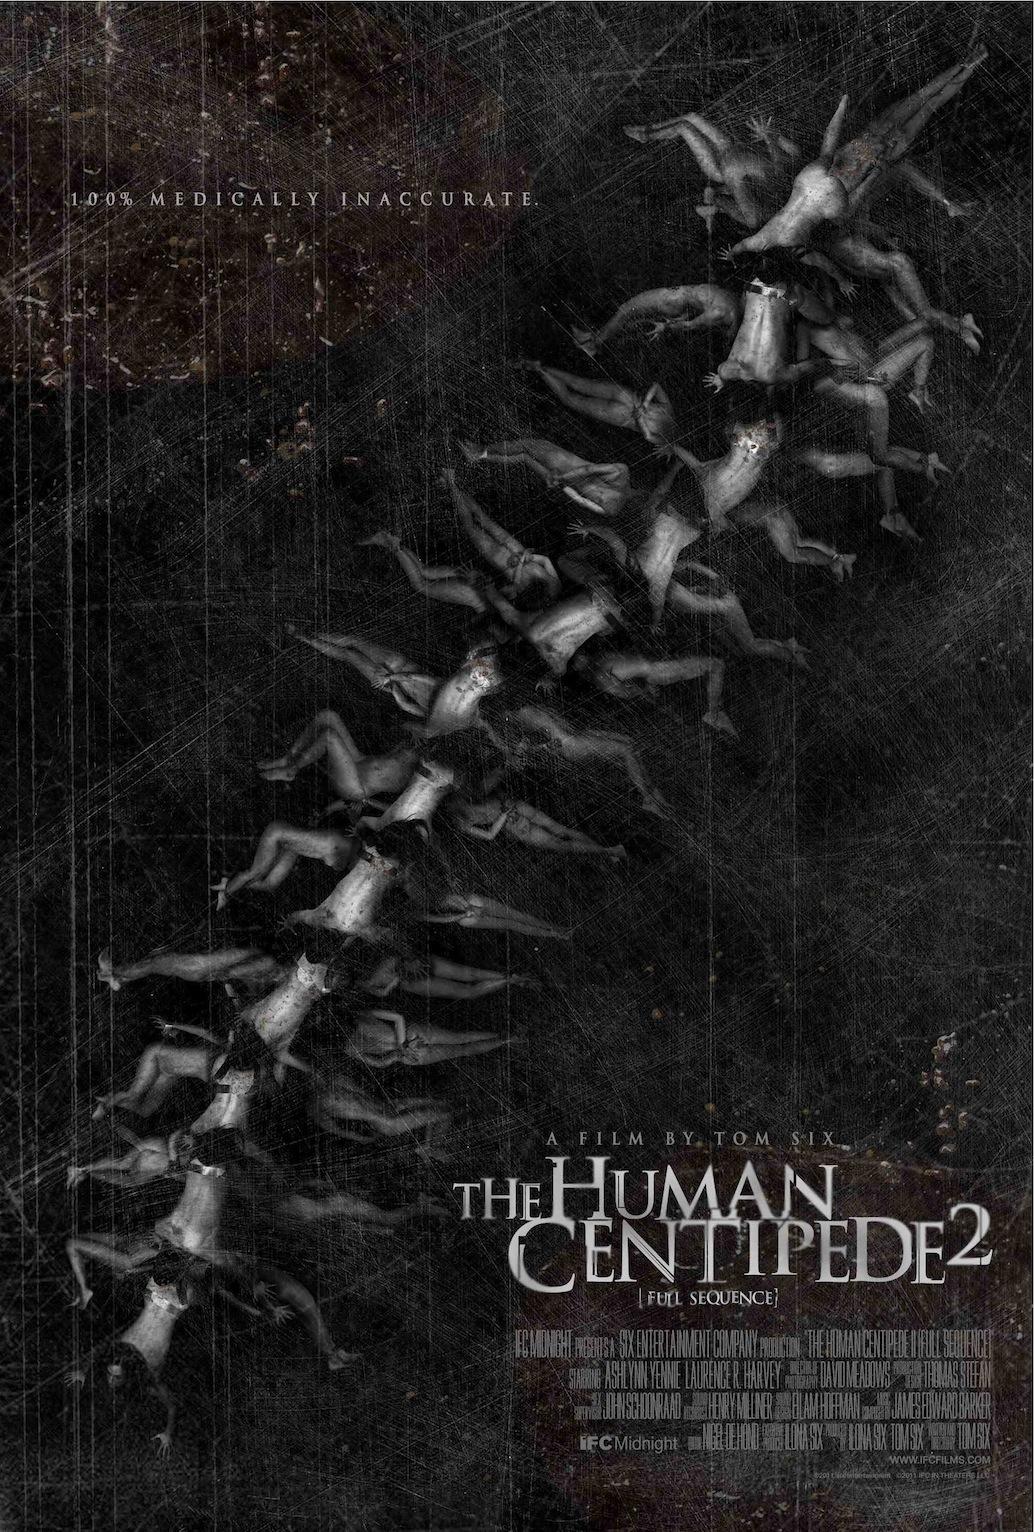 The Human Centipede II